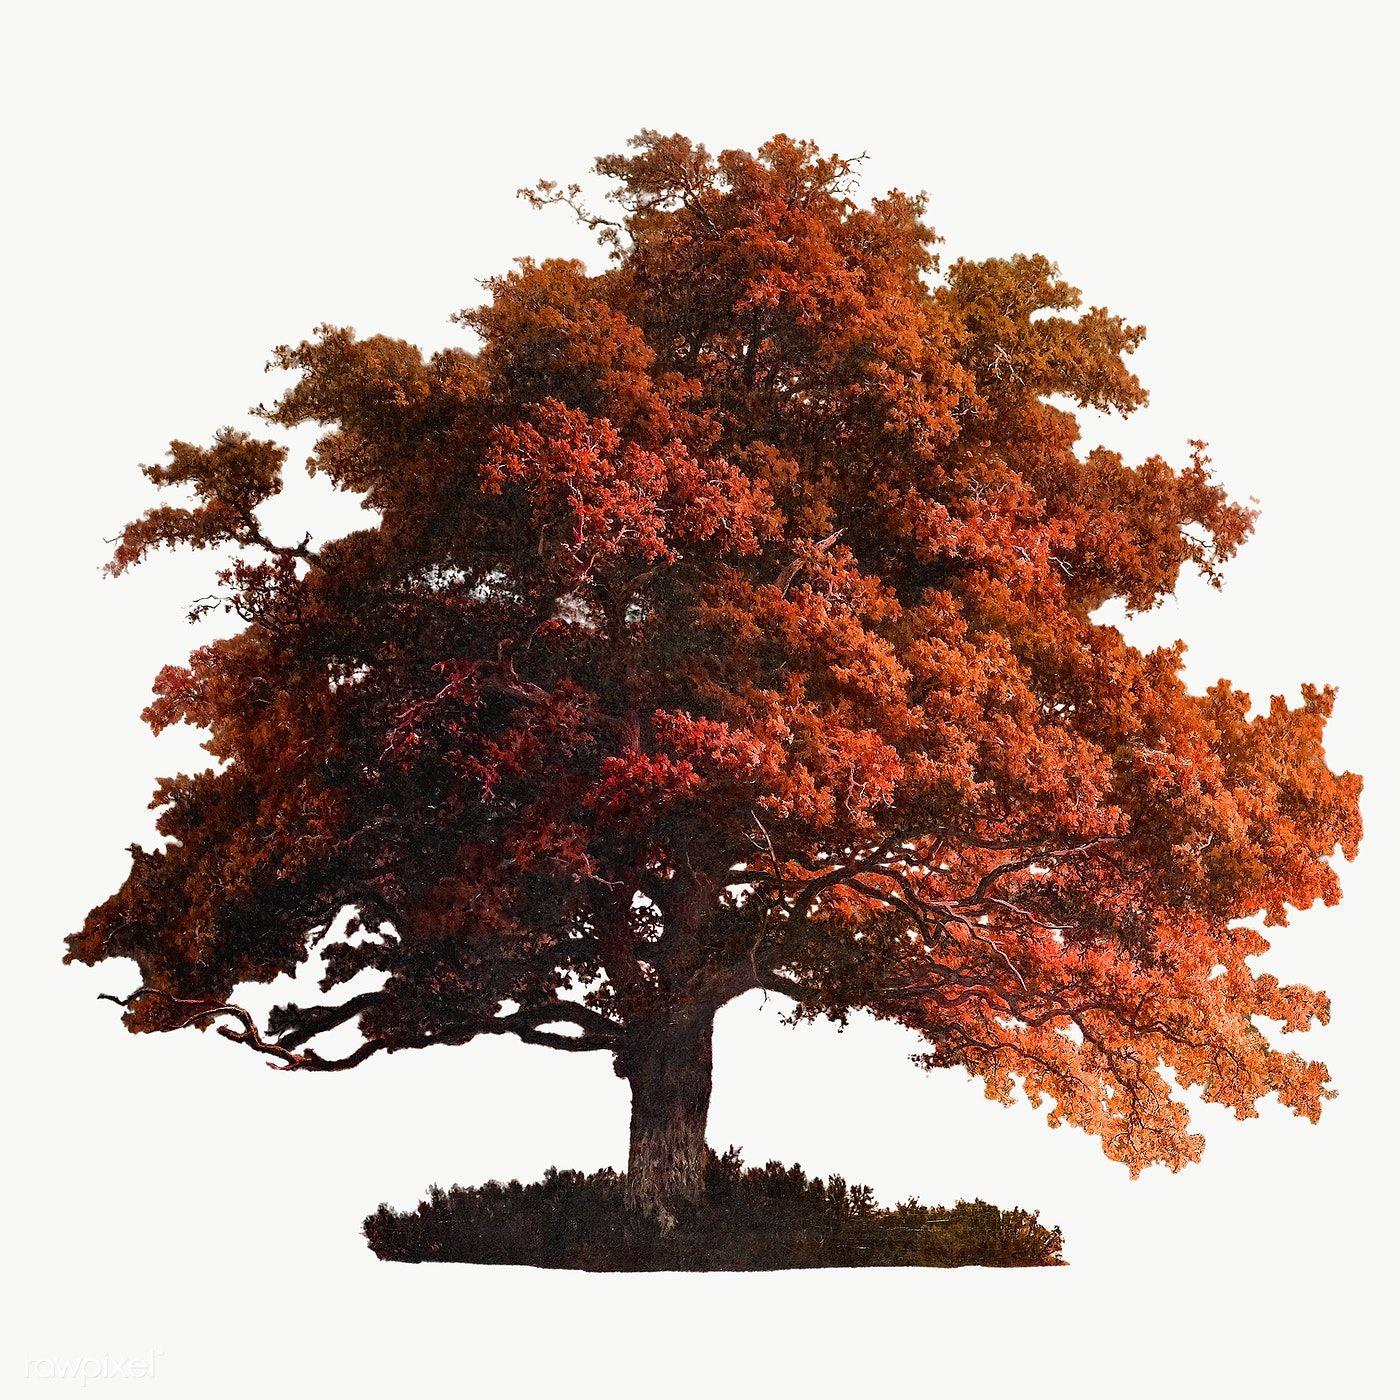 Fall Tree Clipart Autumn Tree Transparent Background 835236 Autumn Trees Deciduous Trees Tree Clipart